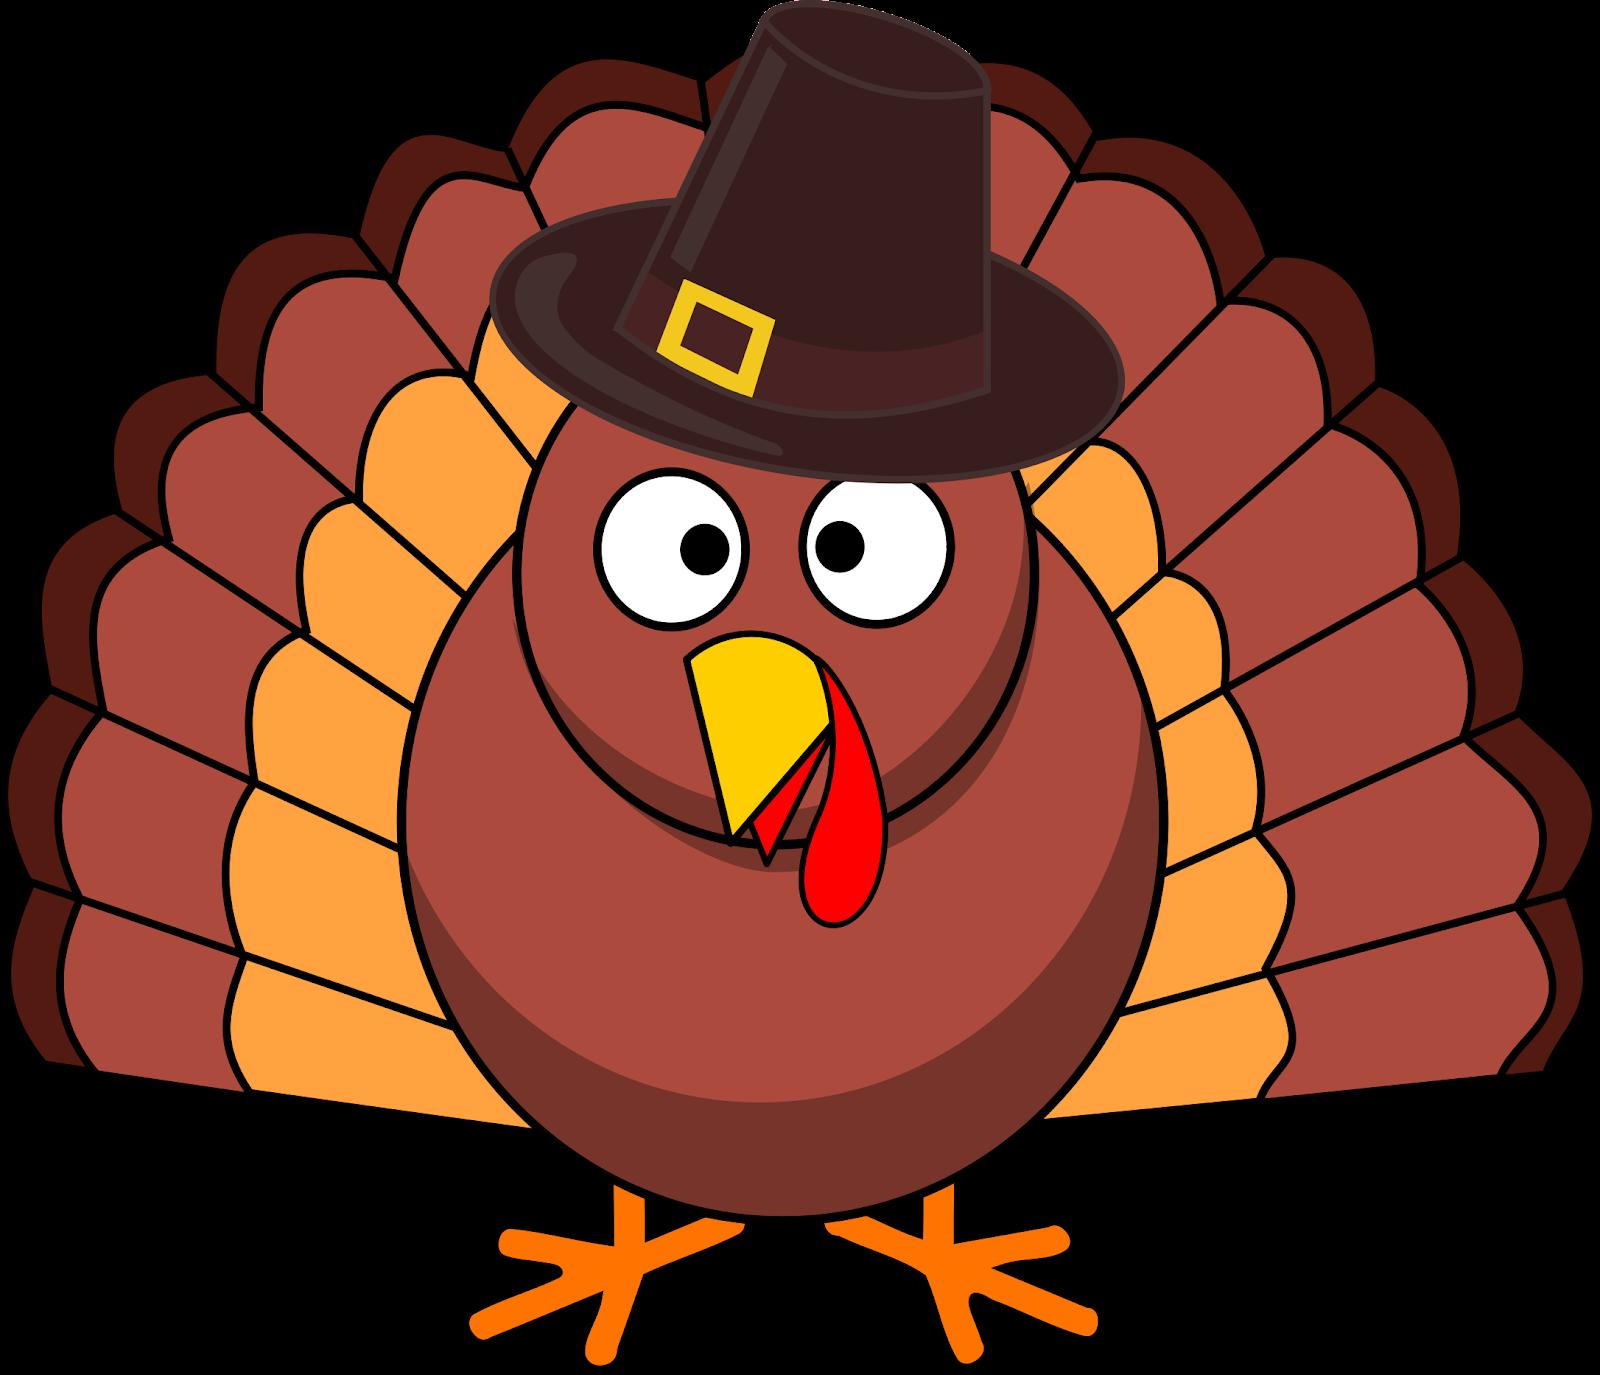 Free Stock Photo of Turkey with Pilgrim Hat vector file - Public ...